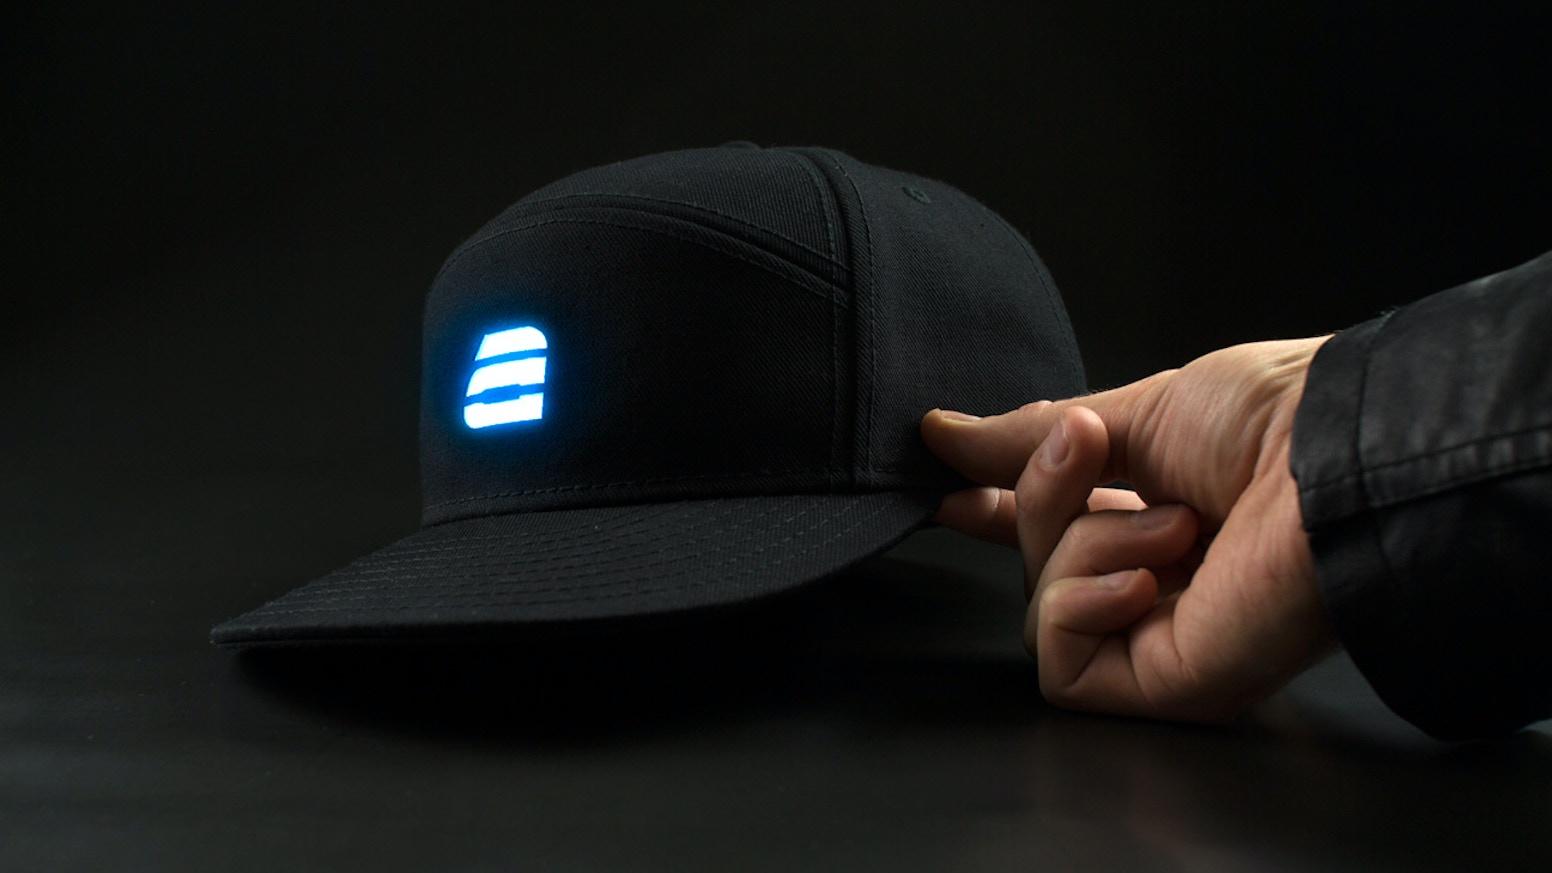 ae4c95c9 THE LUMATIV SNAPBACK HAT by LUMATIV — Kickstarter